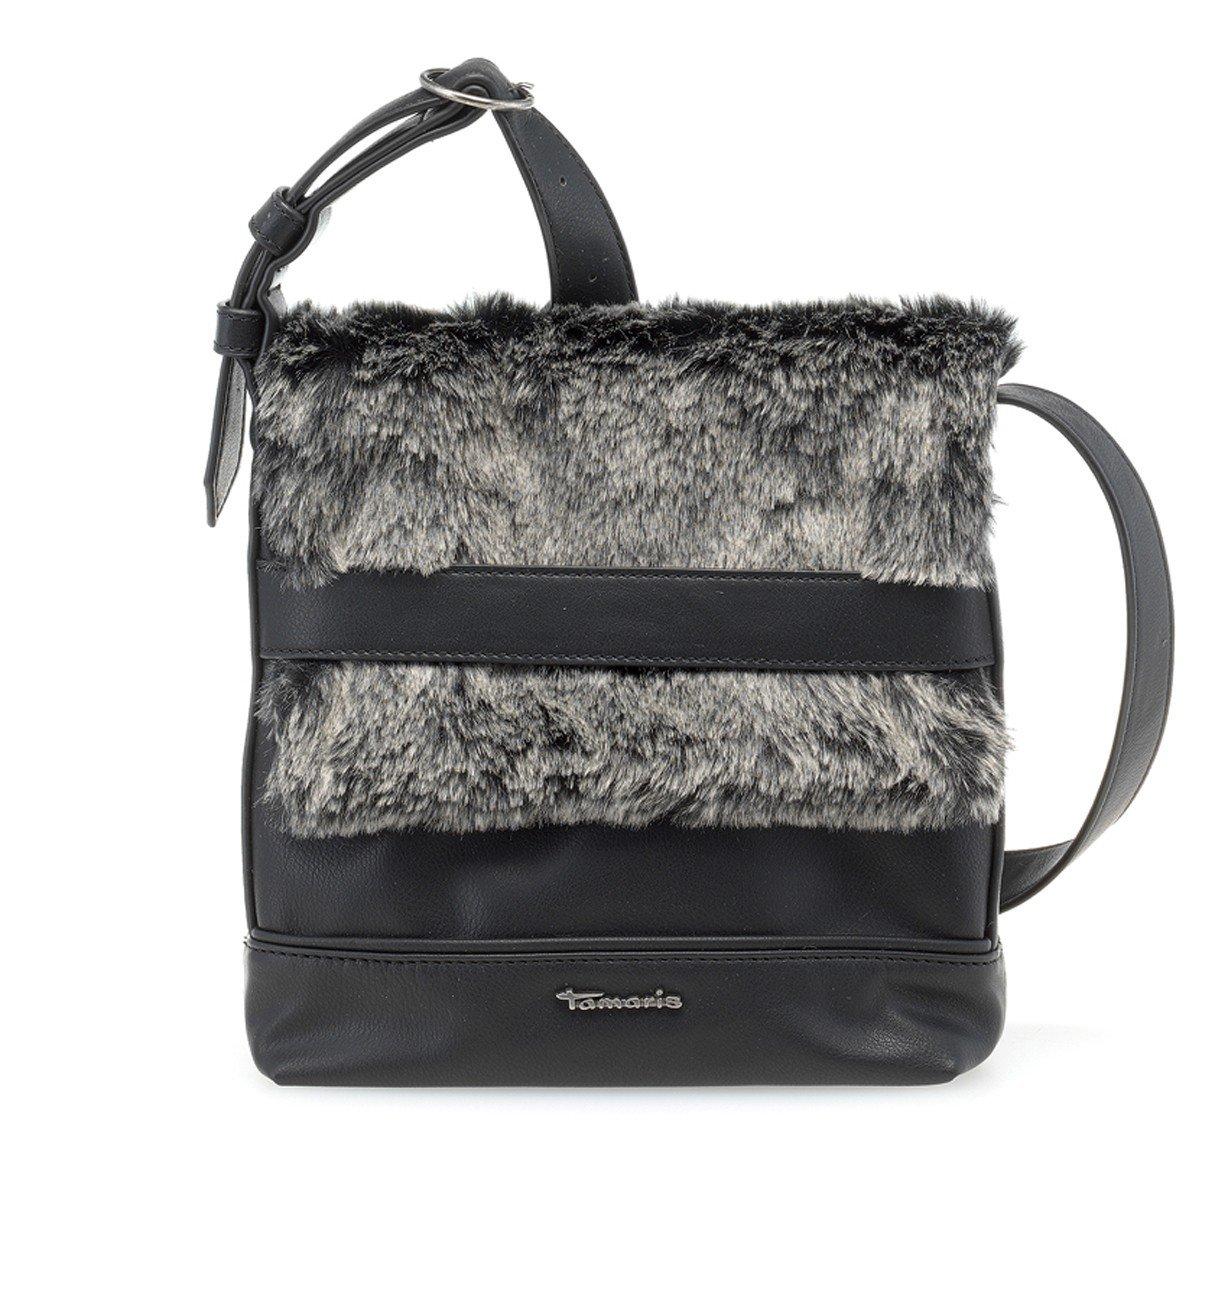 ANDIE Damen Handtasche, Crossbody Bag, Umhängetasche, 25x24x2 cm (B x H x T), Fellimitat, 3 Farben: braun comb, taupe comb. oder schwarz comb, Farbe:schwarz comb Tamaris